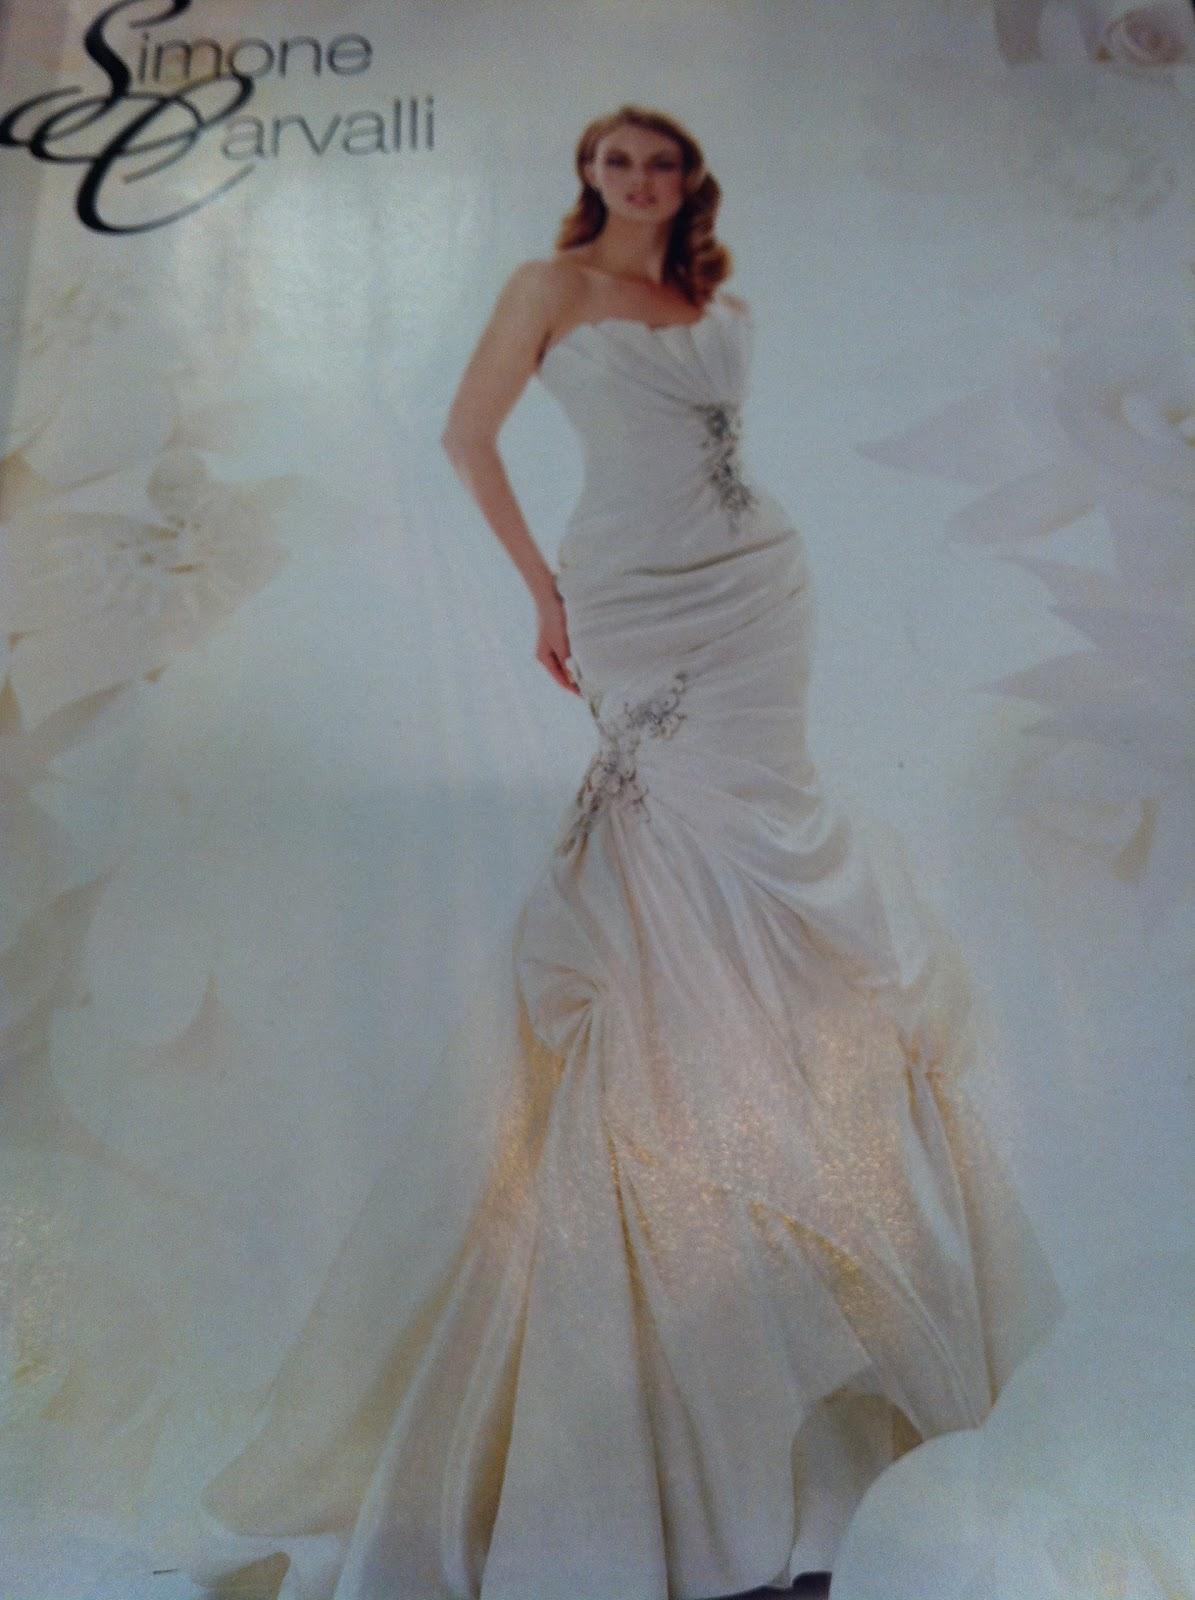 irish wedding dresses The